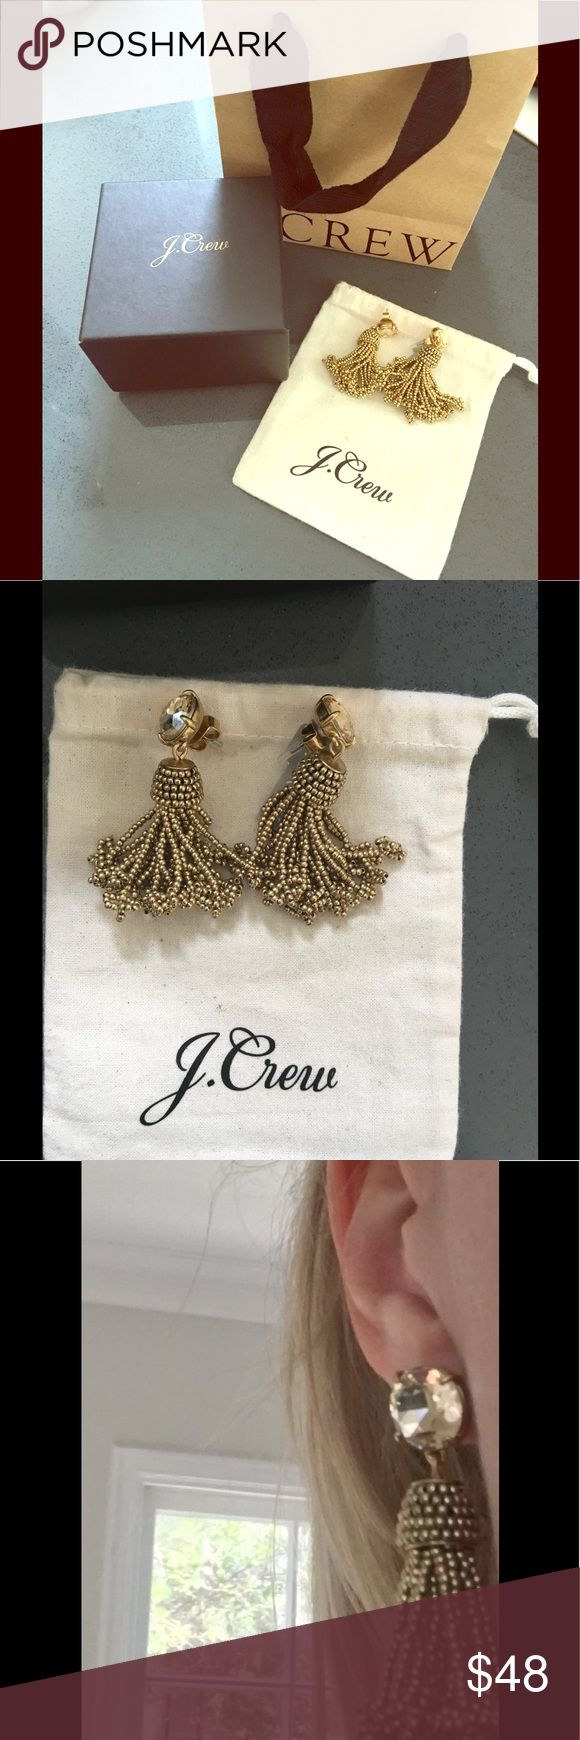 New w/ tag J.Crew Gold Tassel Earrings New w/ tag J.Crew Gold Tassel Earrings. Includes dust bag- gift box -mini shopping bag.   trend right  tassel earring. J. Crew Jewelry Earrings